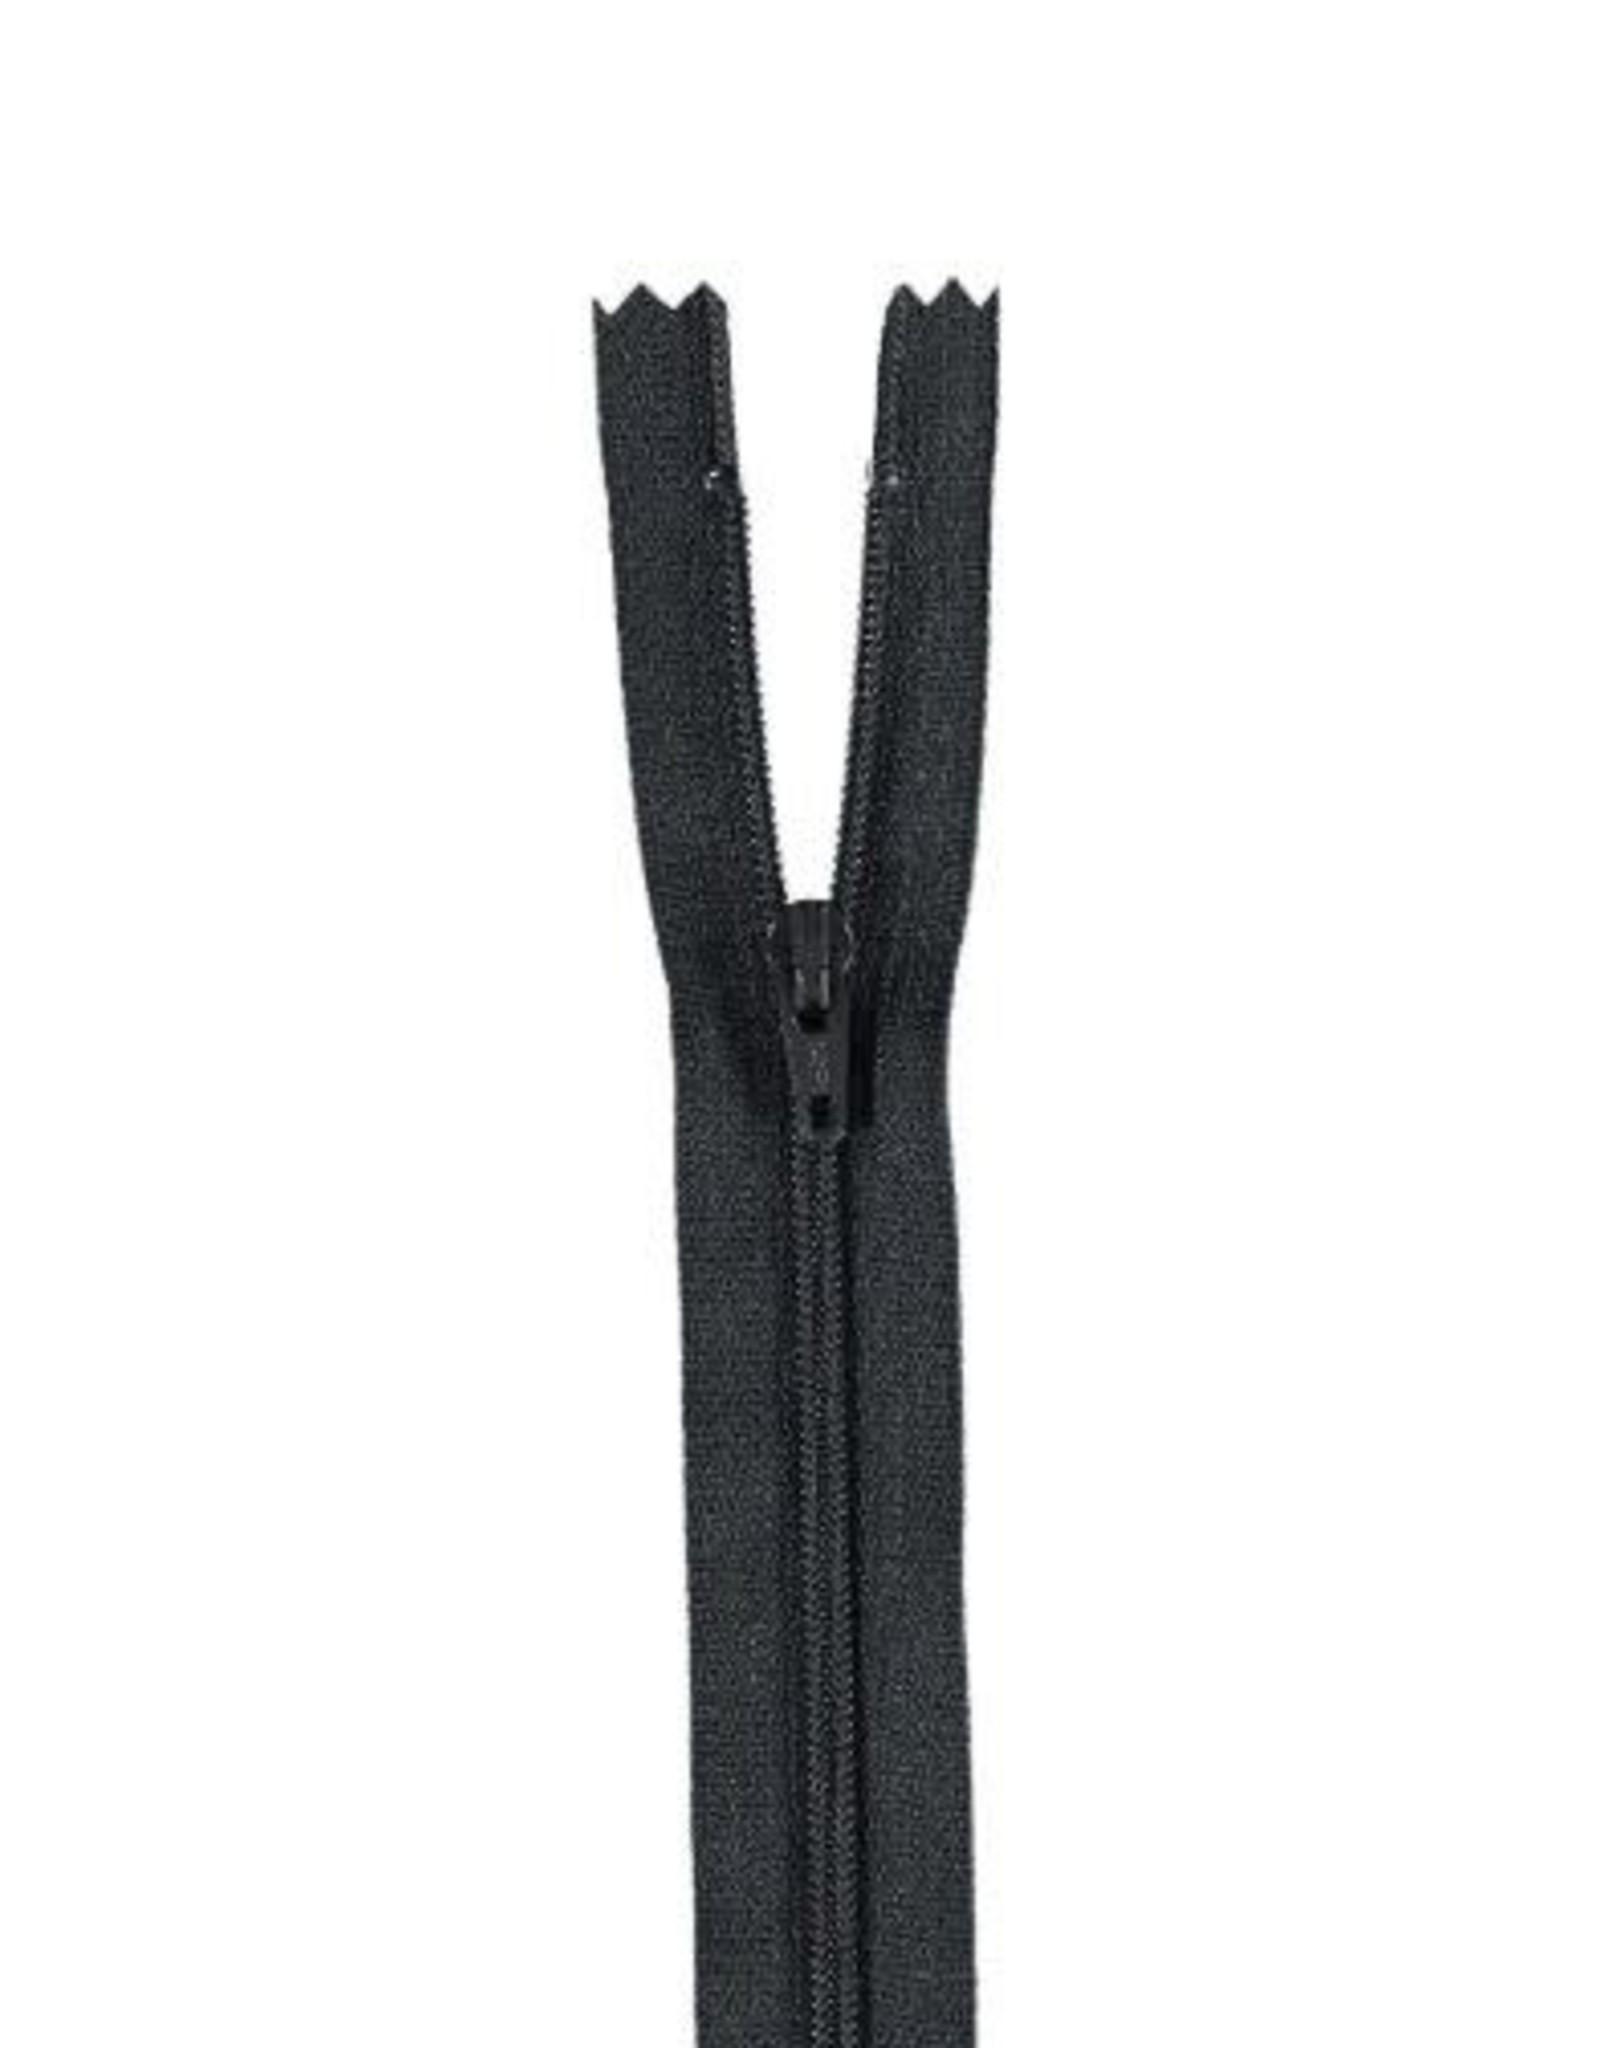 YKK Spiraalrits niet-DB 3mm antraciet 156-55cm